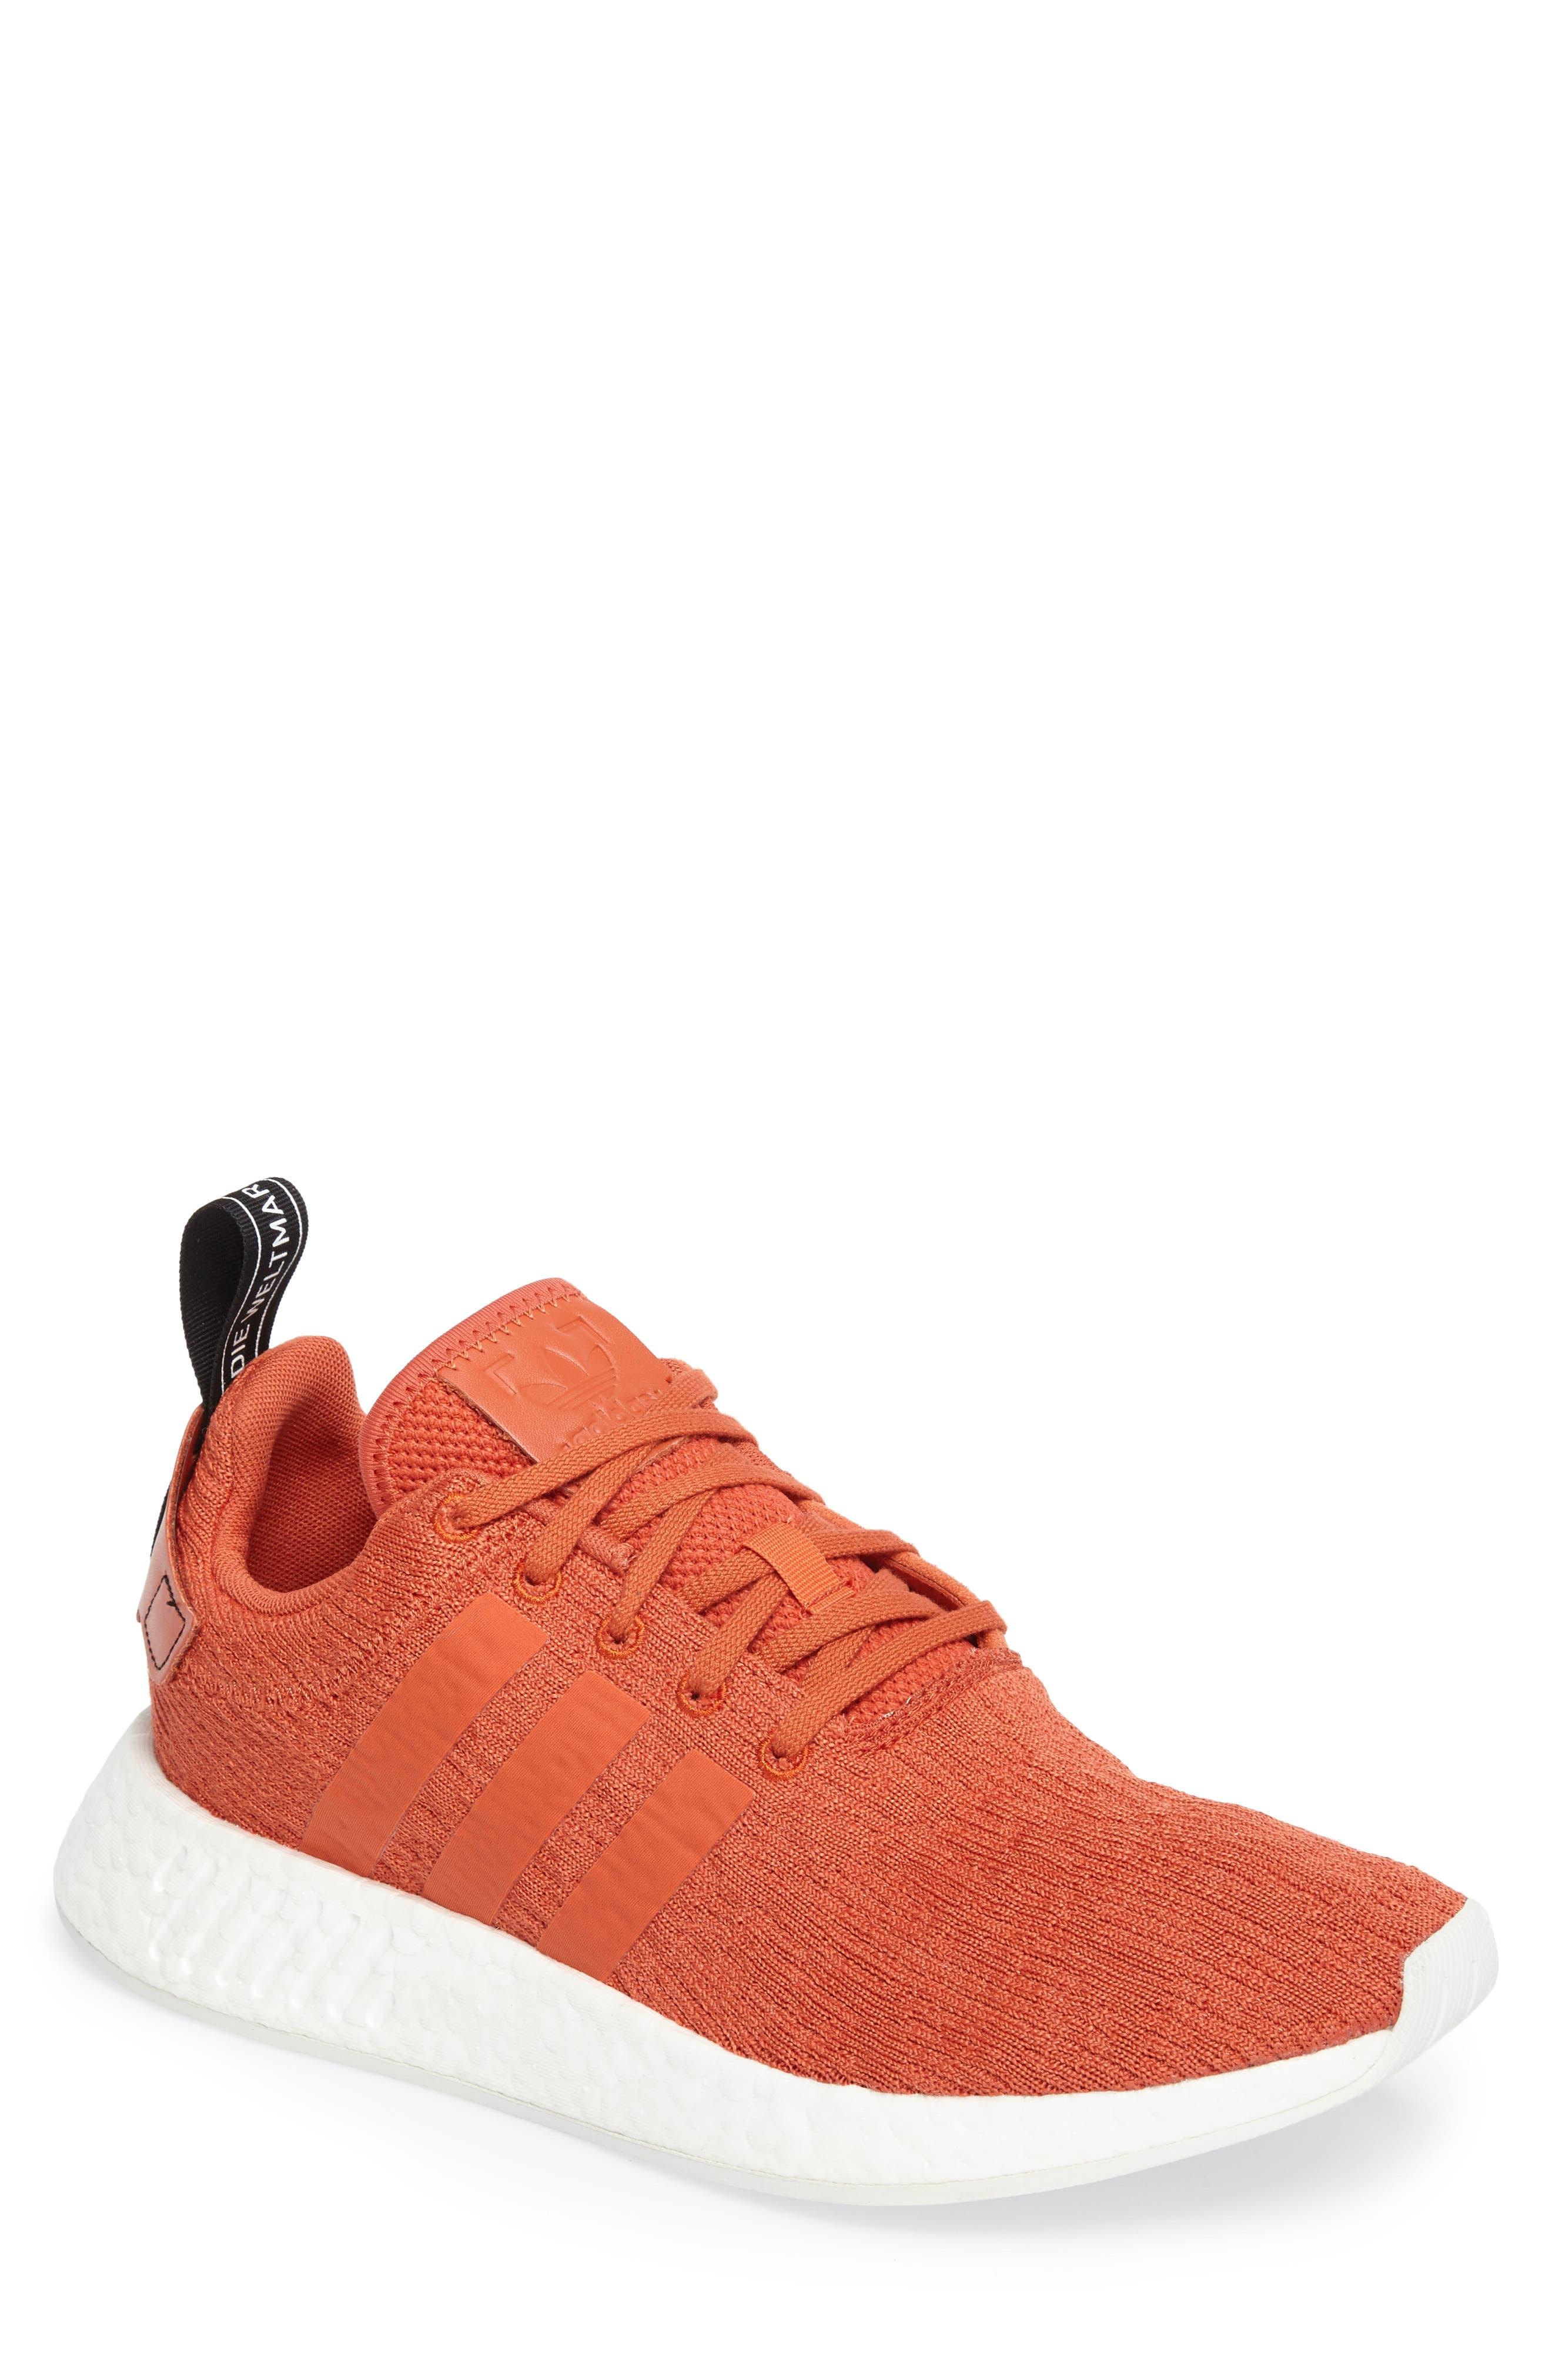 adidas NMD R2 Sneaker (Men)